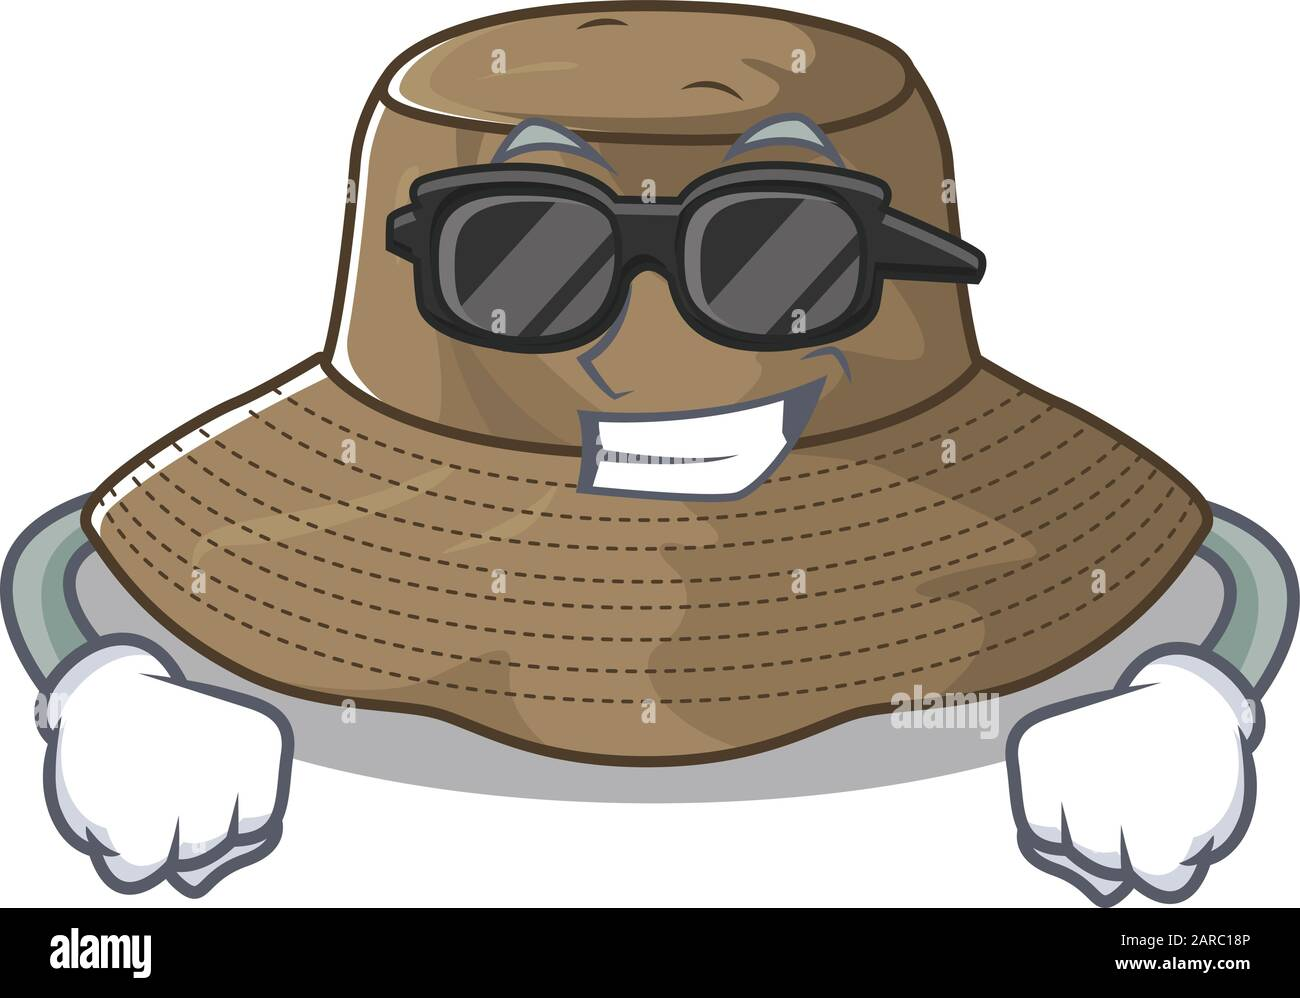 Super Cool Bucket Hat Character Wearing Black Glasses Stock Vector